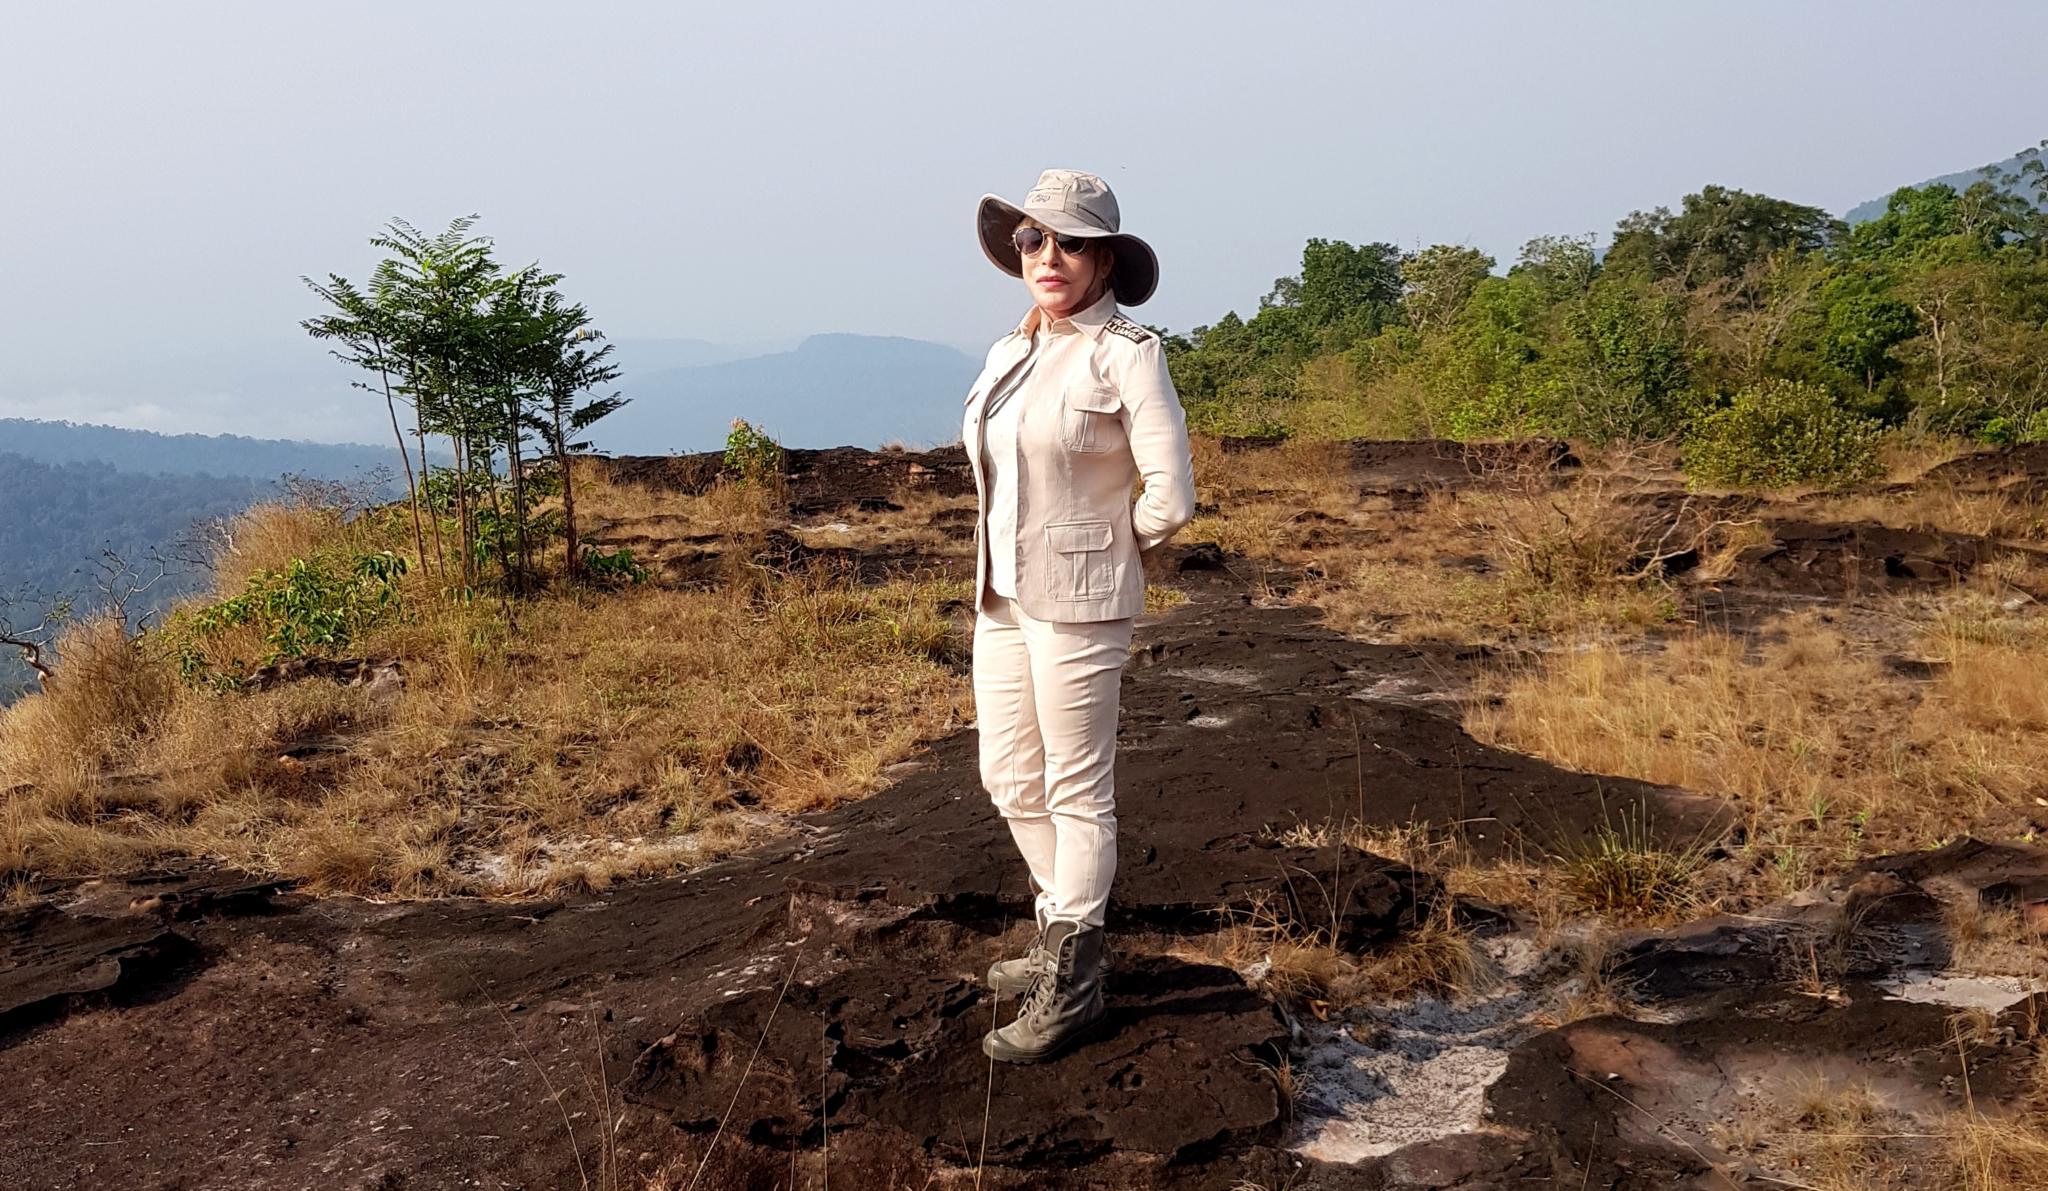 wildlife alliance Wildlife Alliance Founder and CEO, Suwanna Gauntlett visit at Shinta Mani Wild Cardamom CEO Suwanna Gauntlett